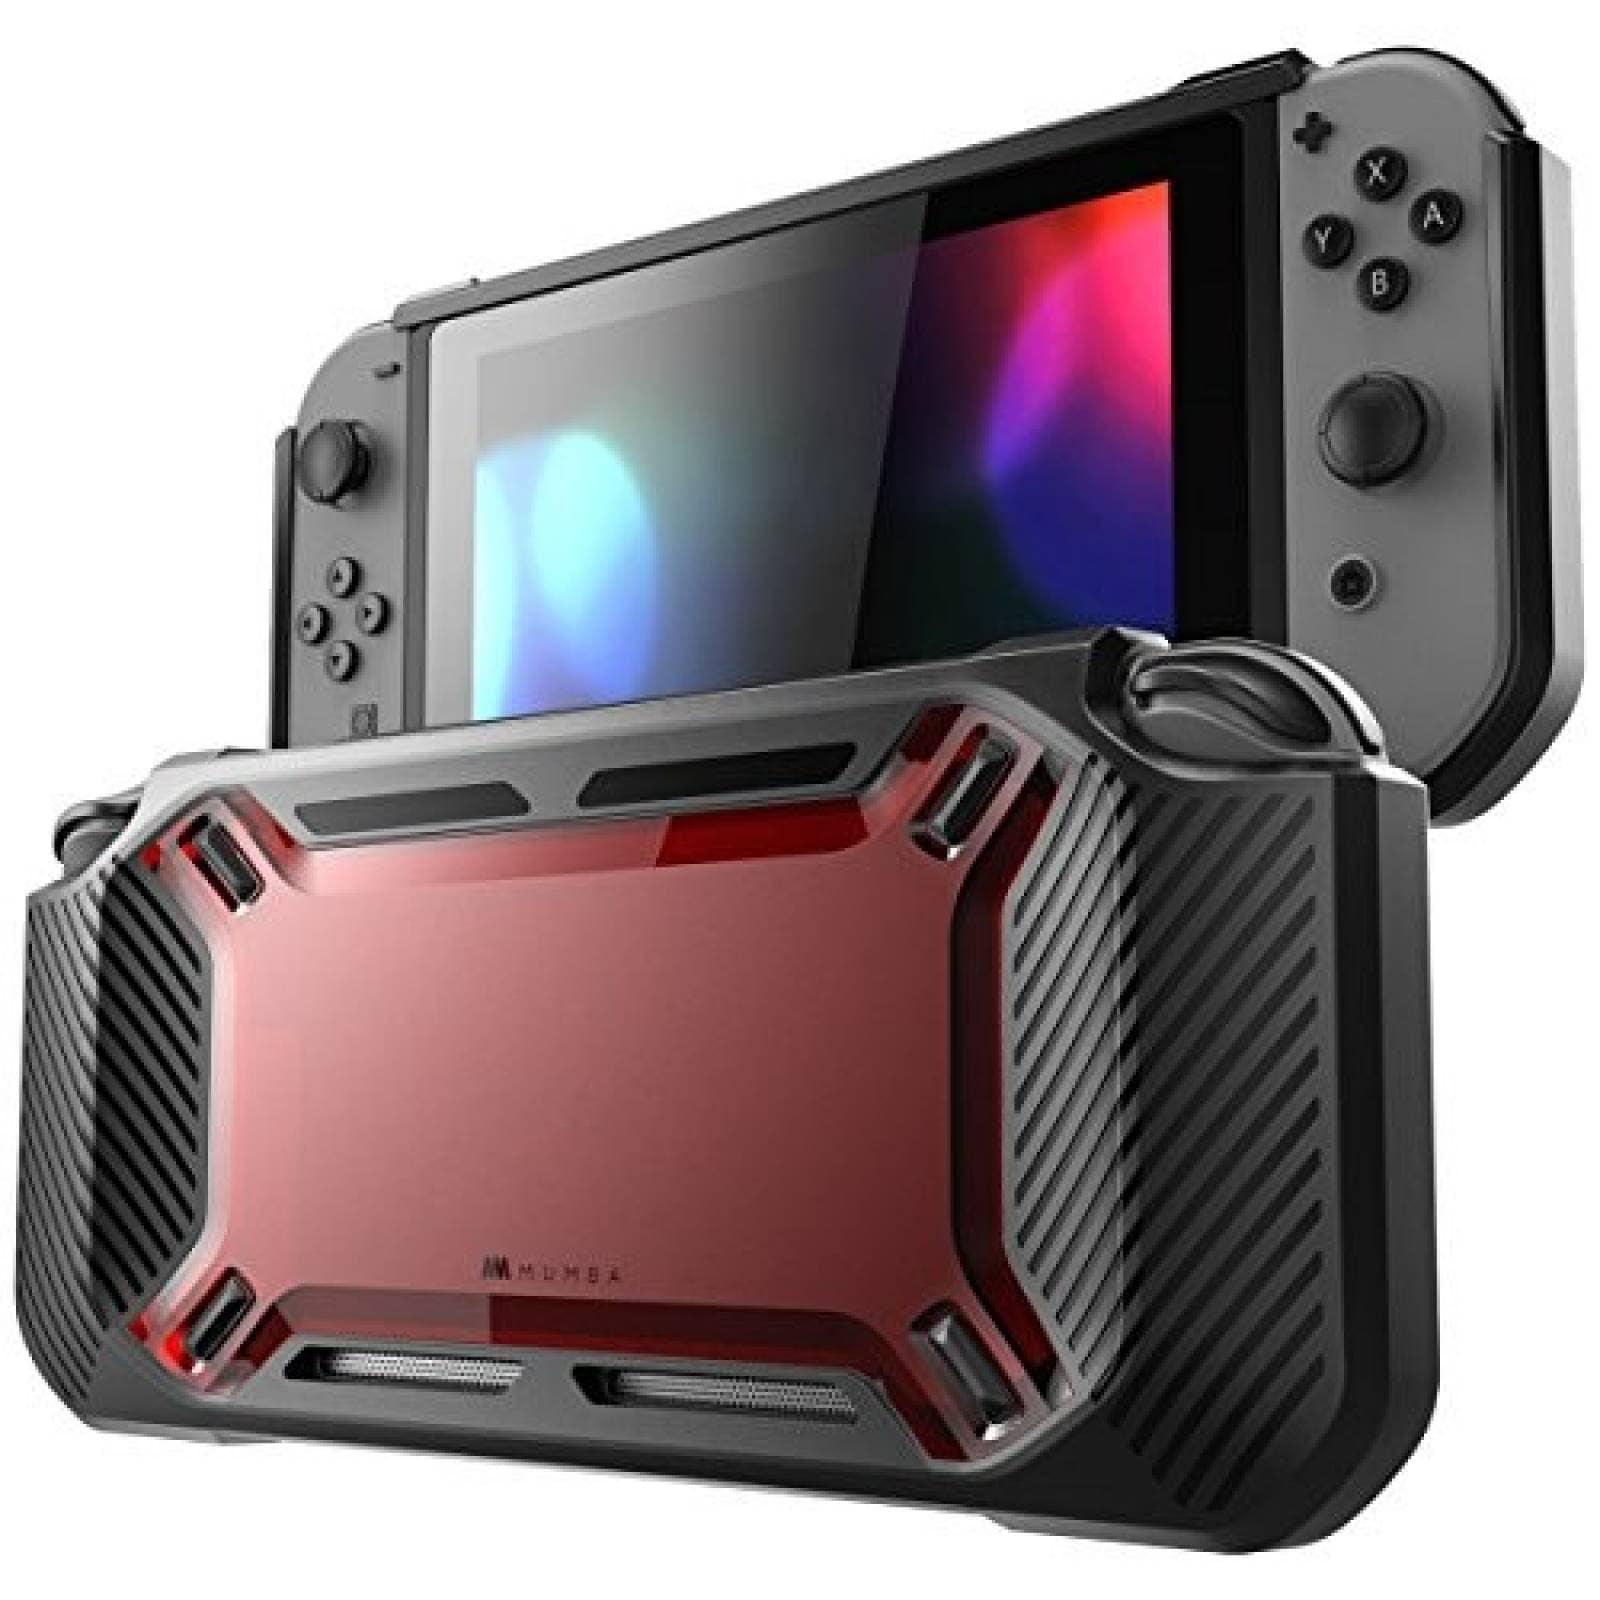 Carcasa Mumba Nintendo Switch 2017 delgada resistente -Rojo